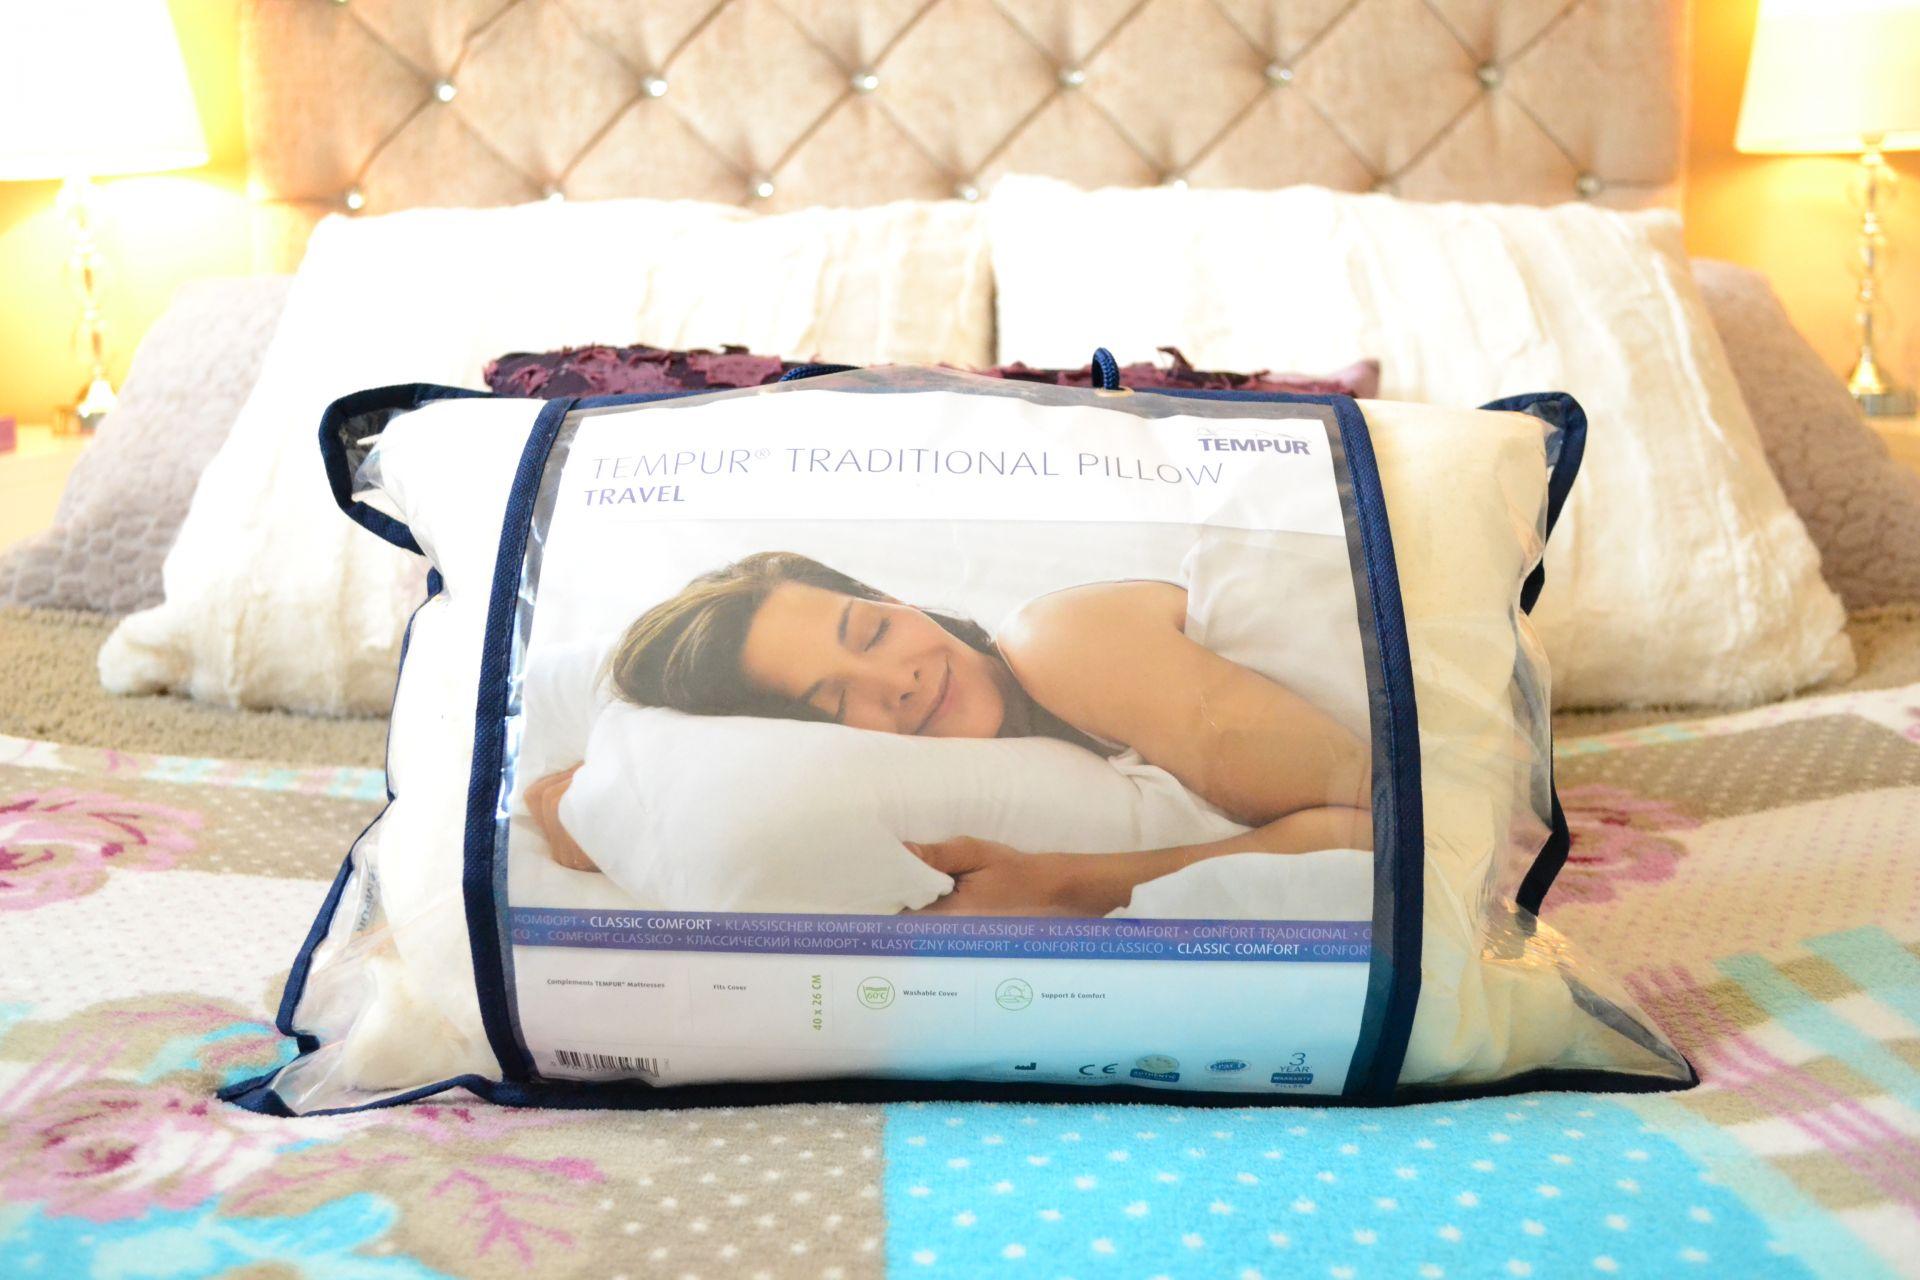 tempur-travel-pillow-review